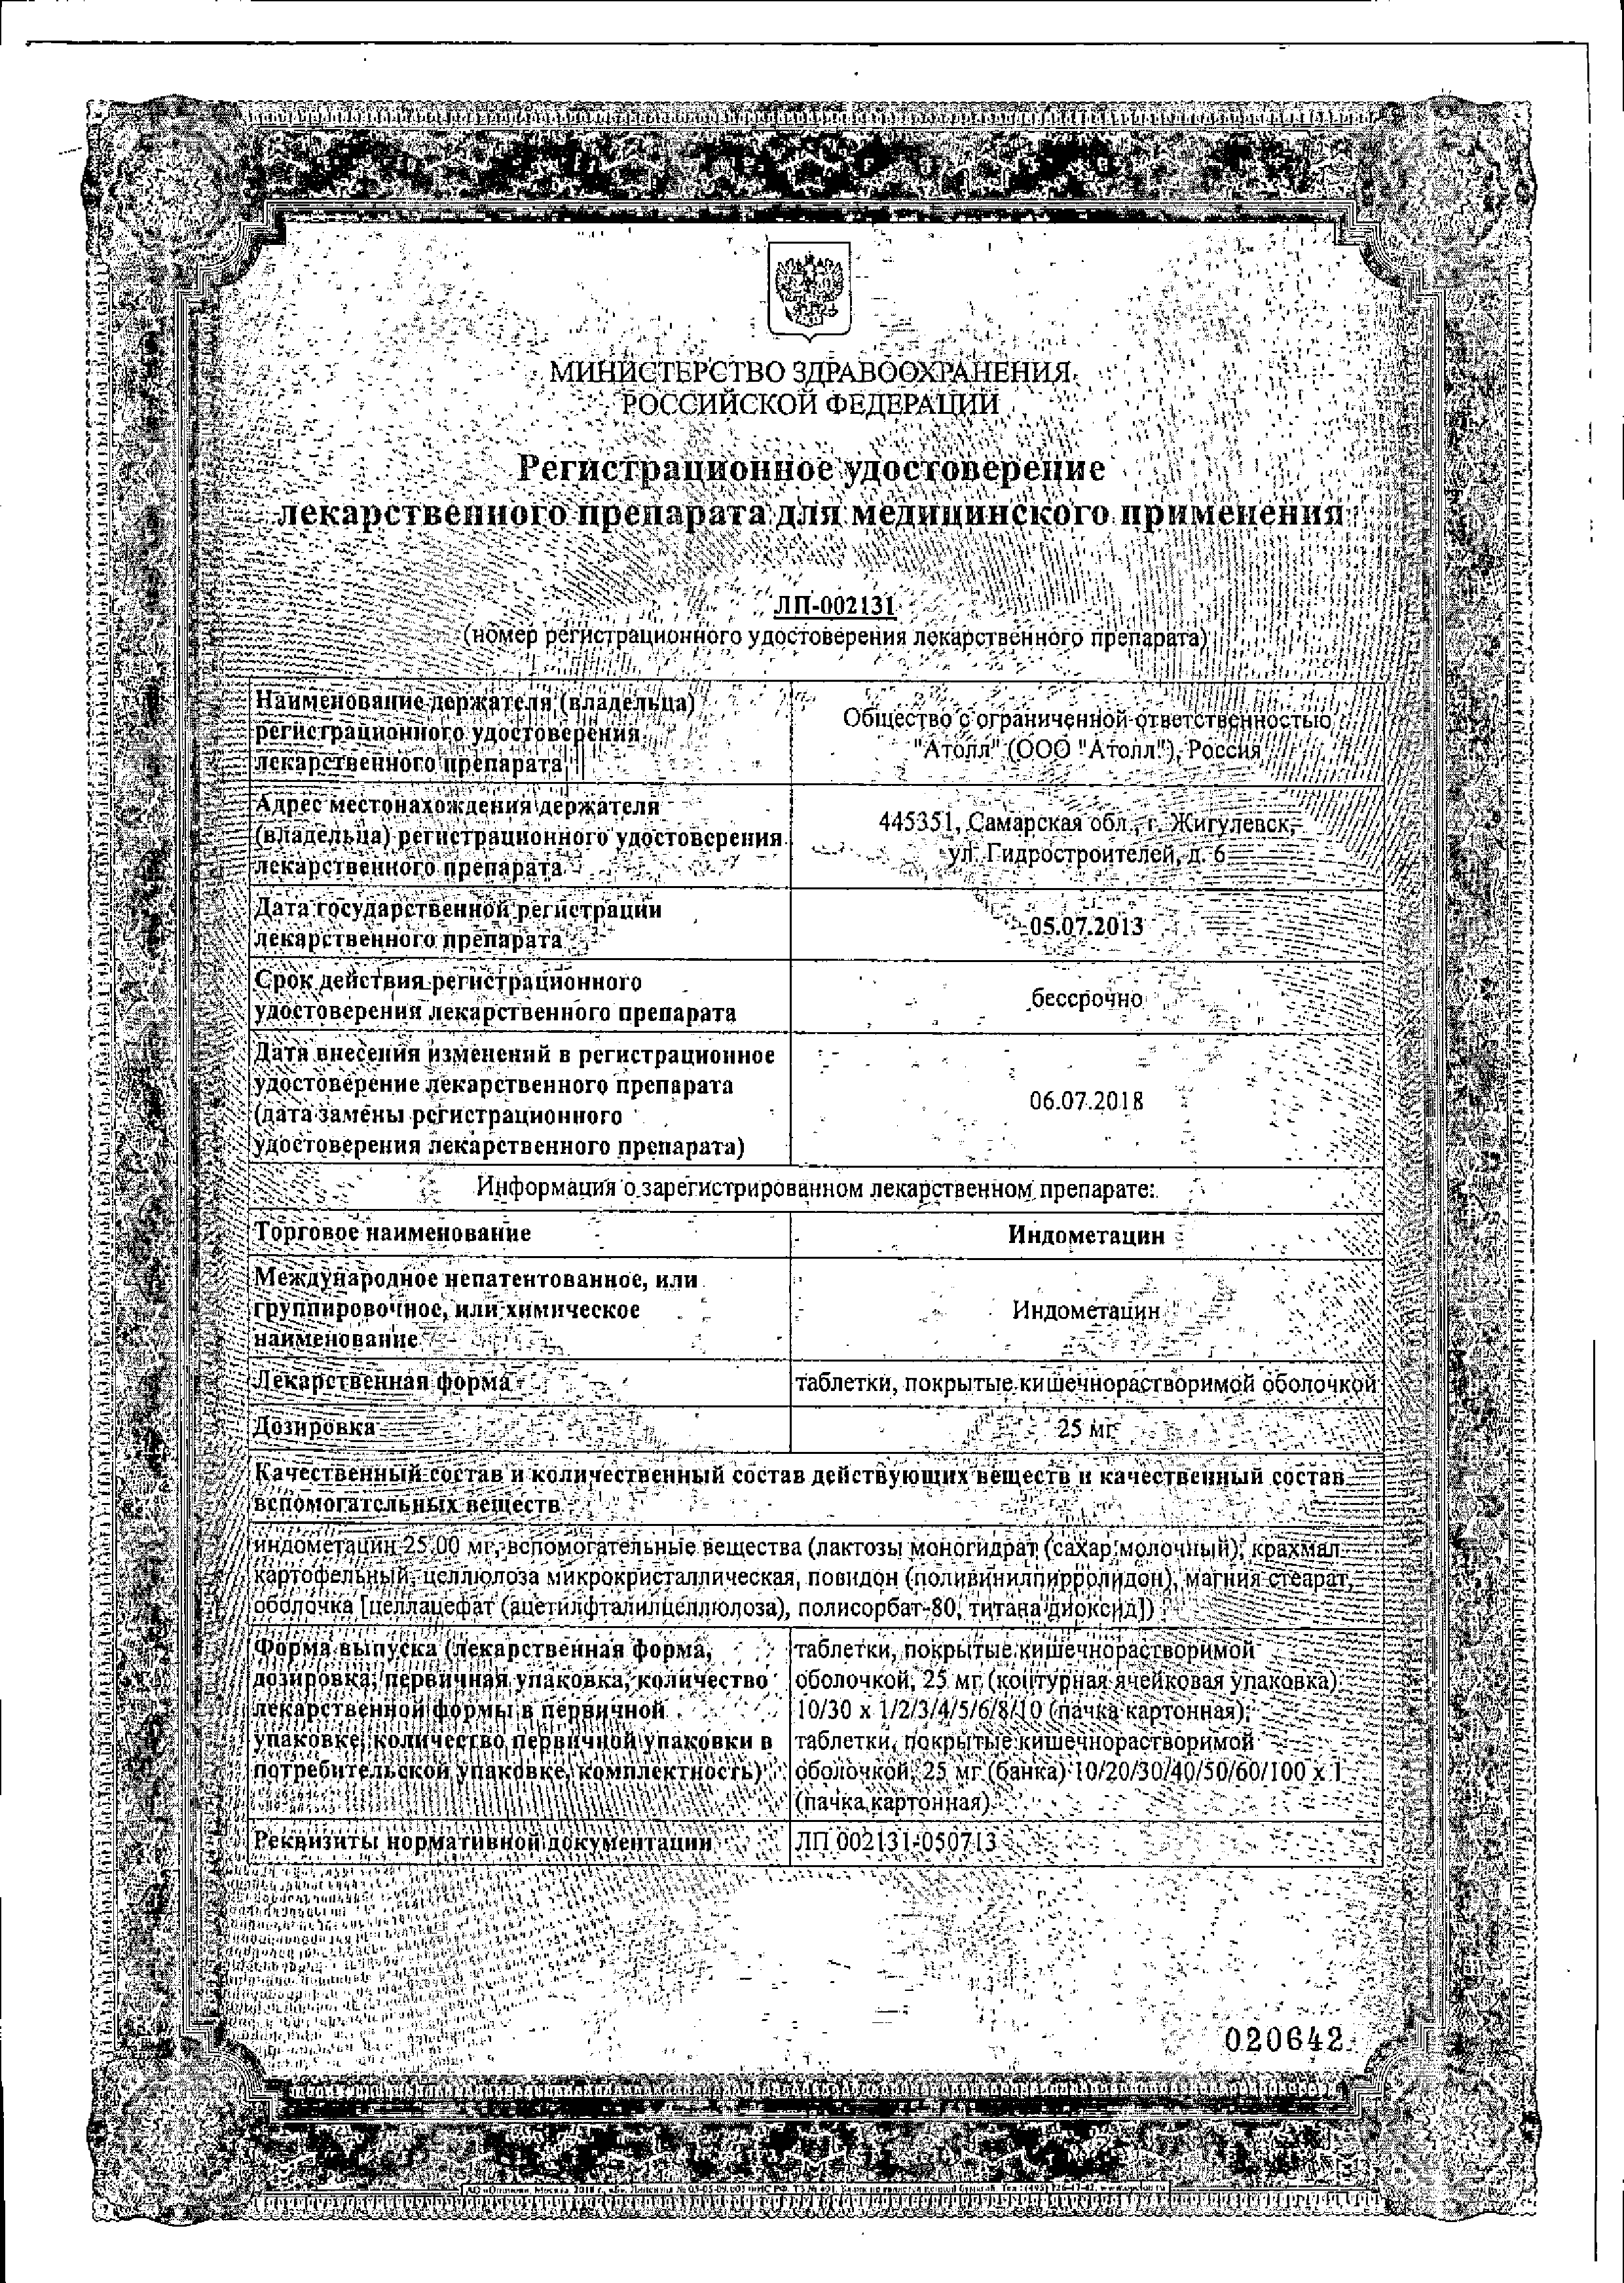 Индометацин сертификат